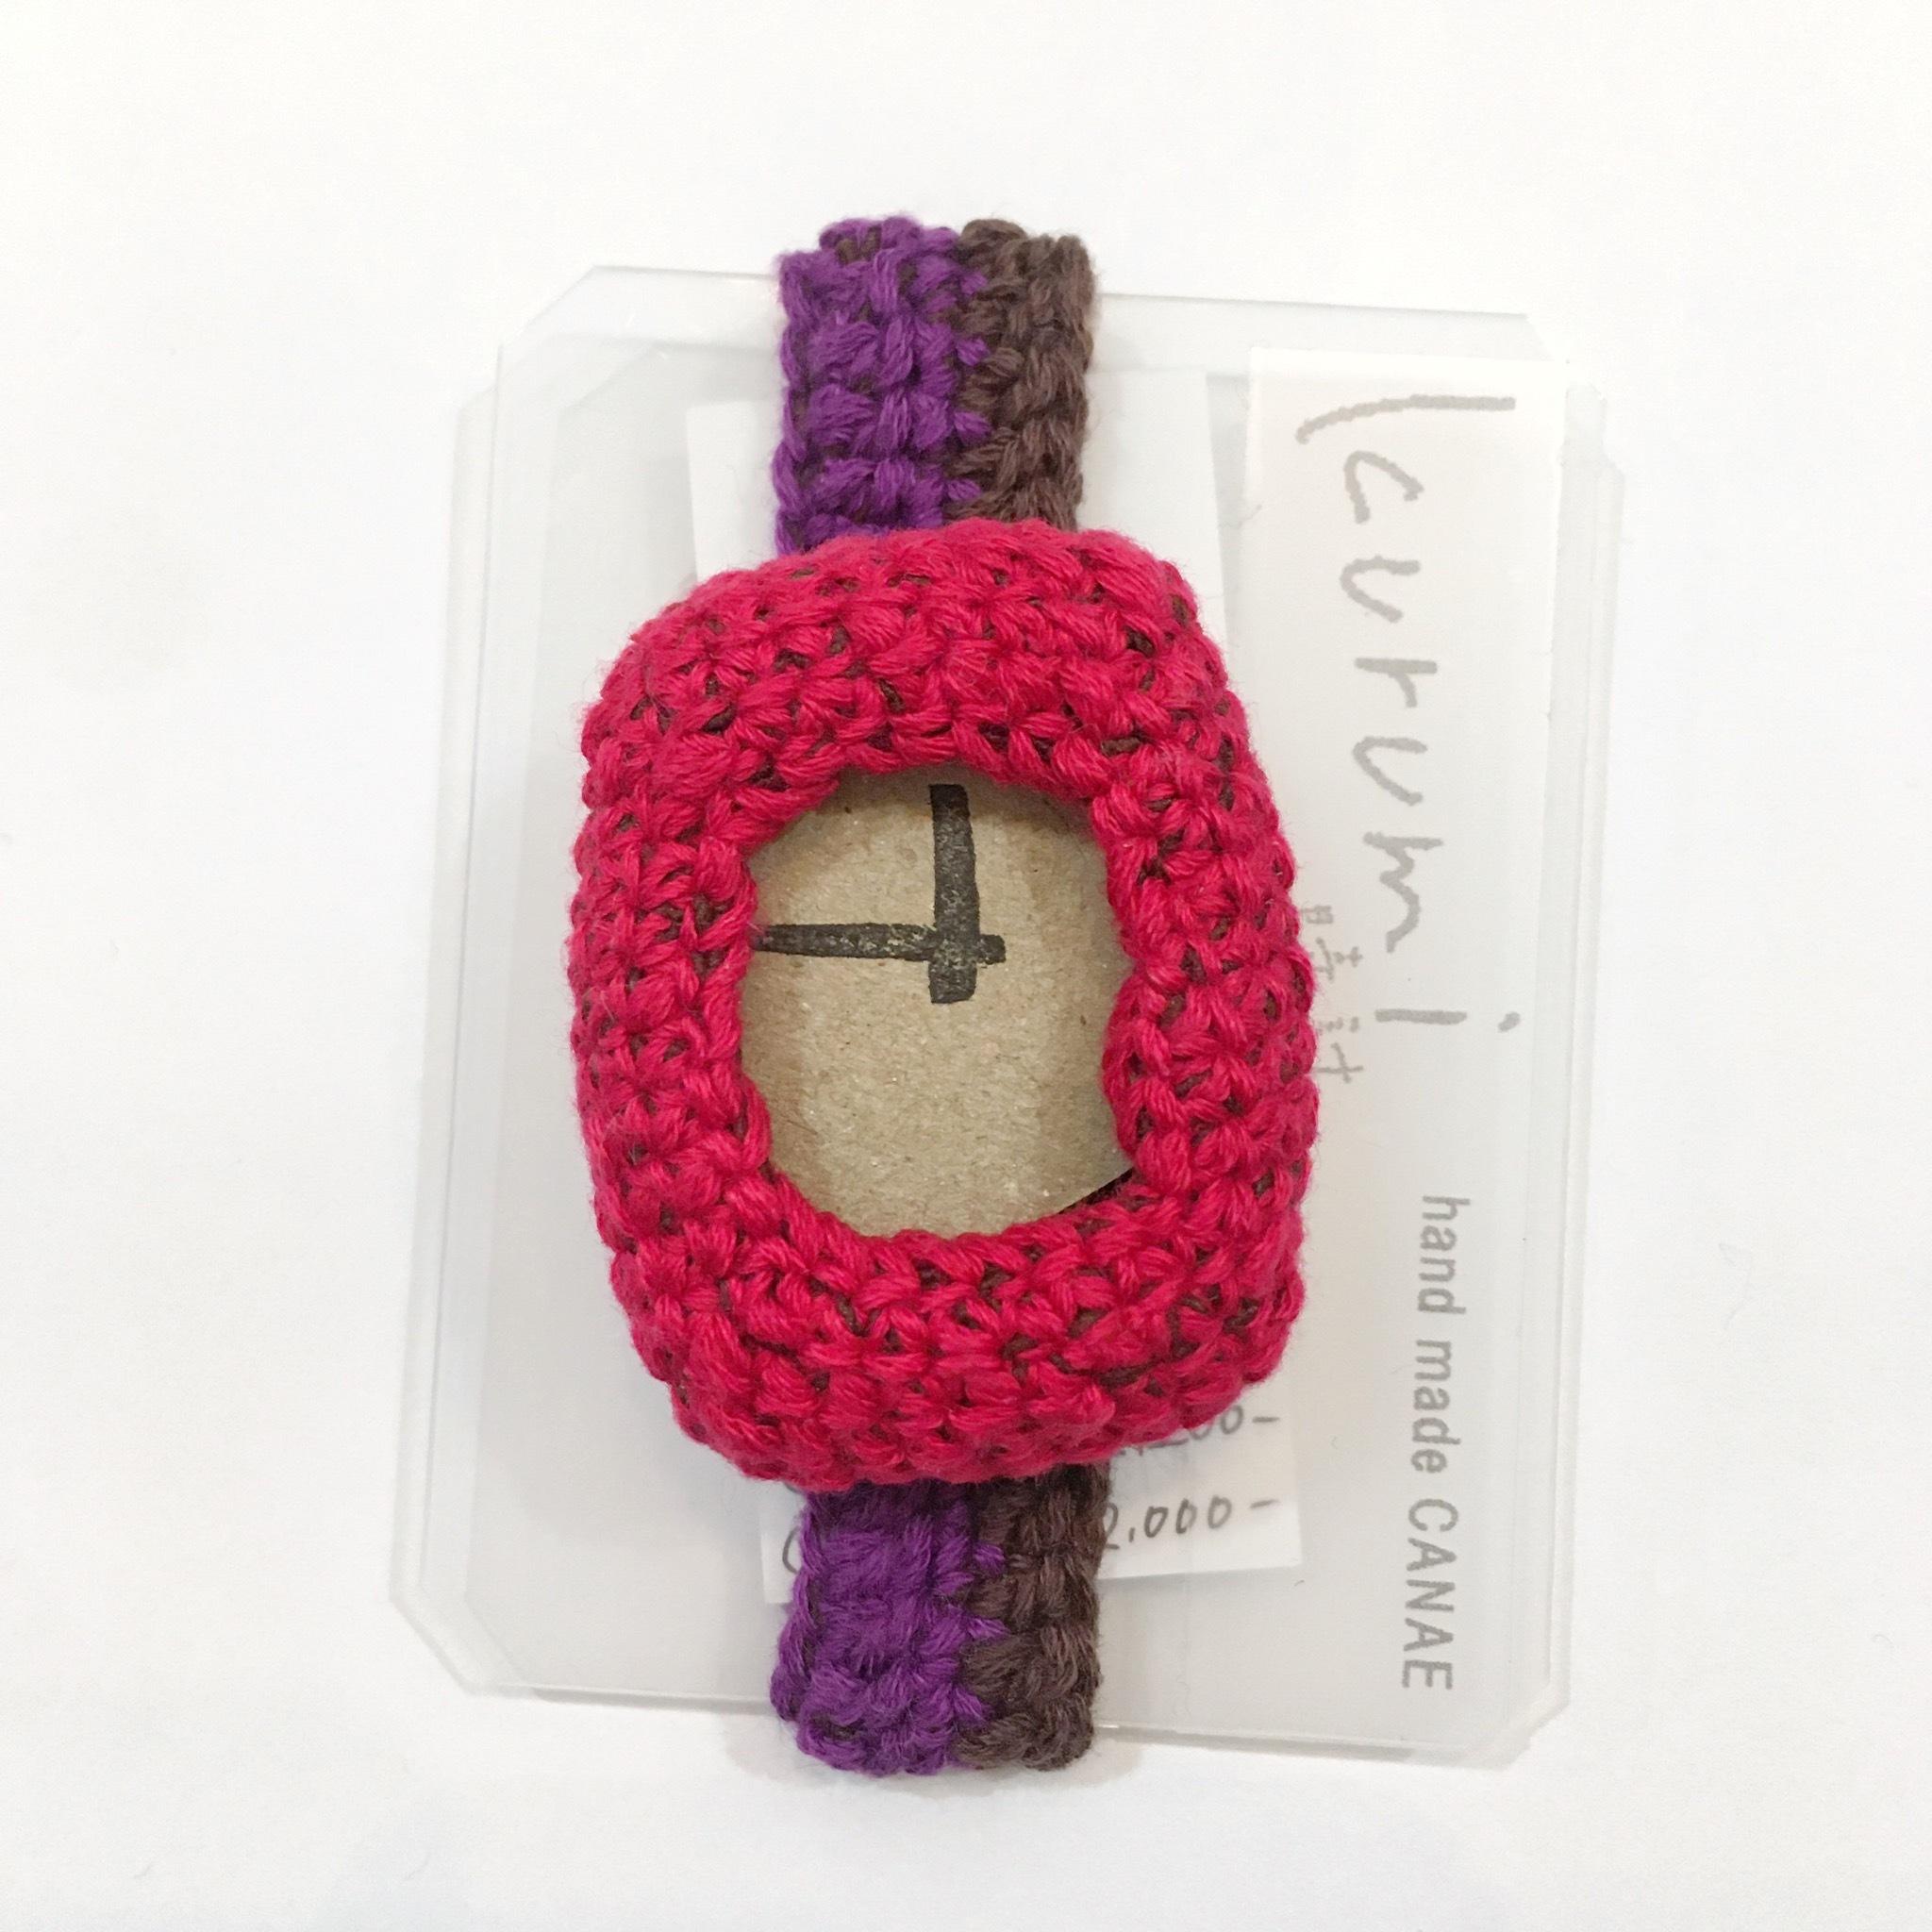 【handmadeCANAE】kurumi時計 替えベルト(大) Mサイズ